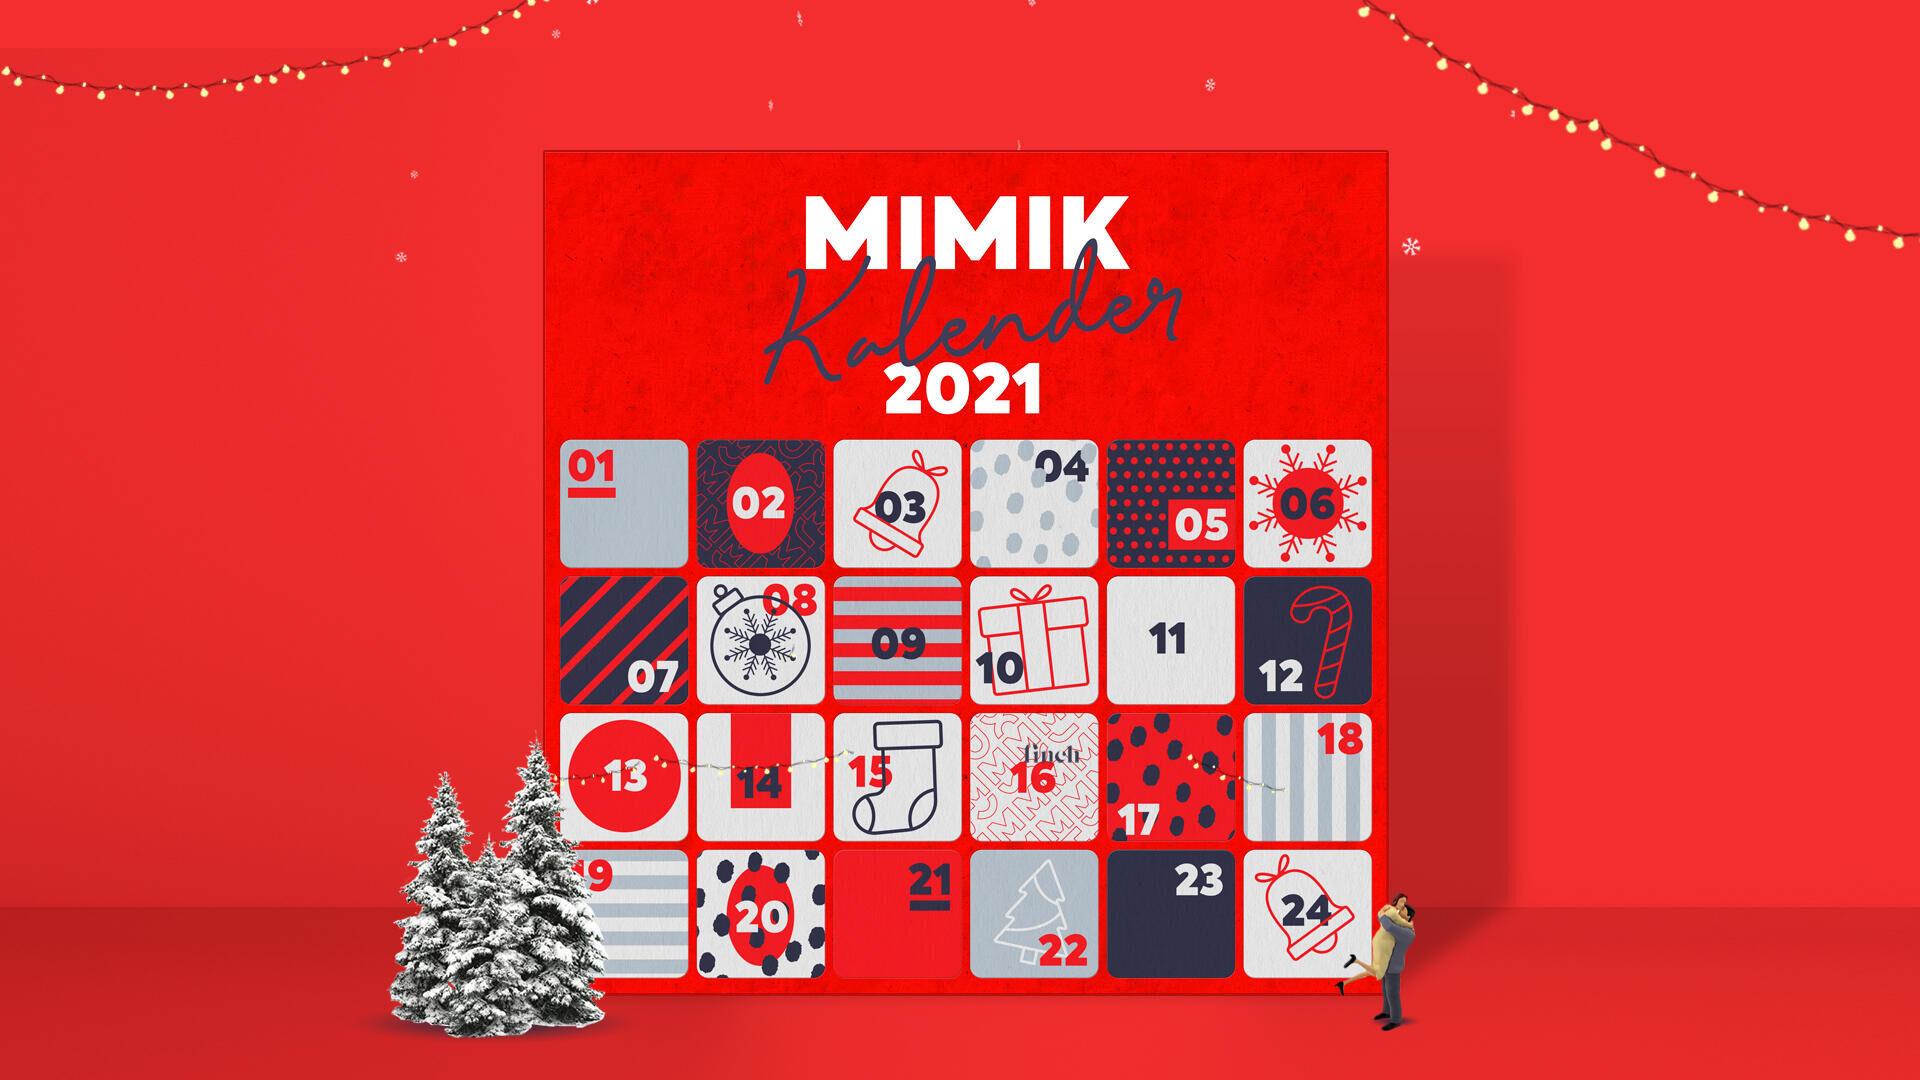 MIMIIK's Adventskalender